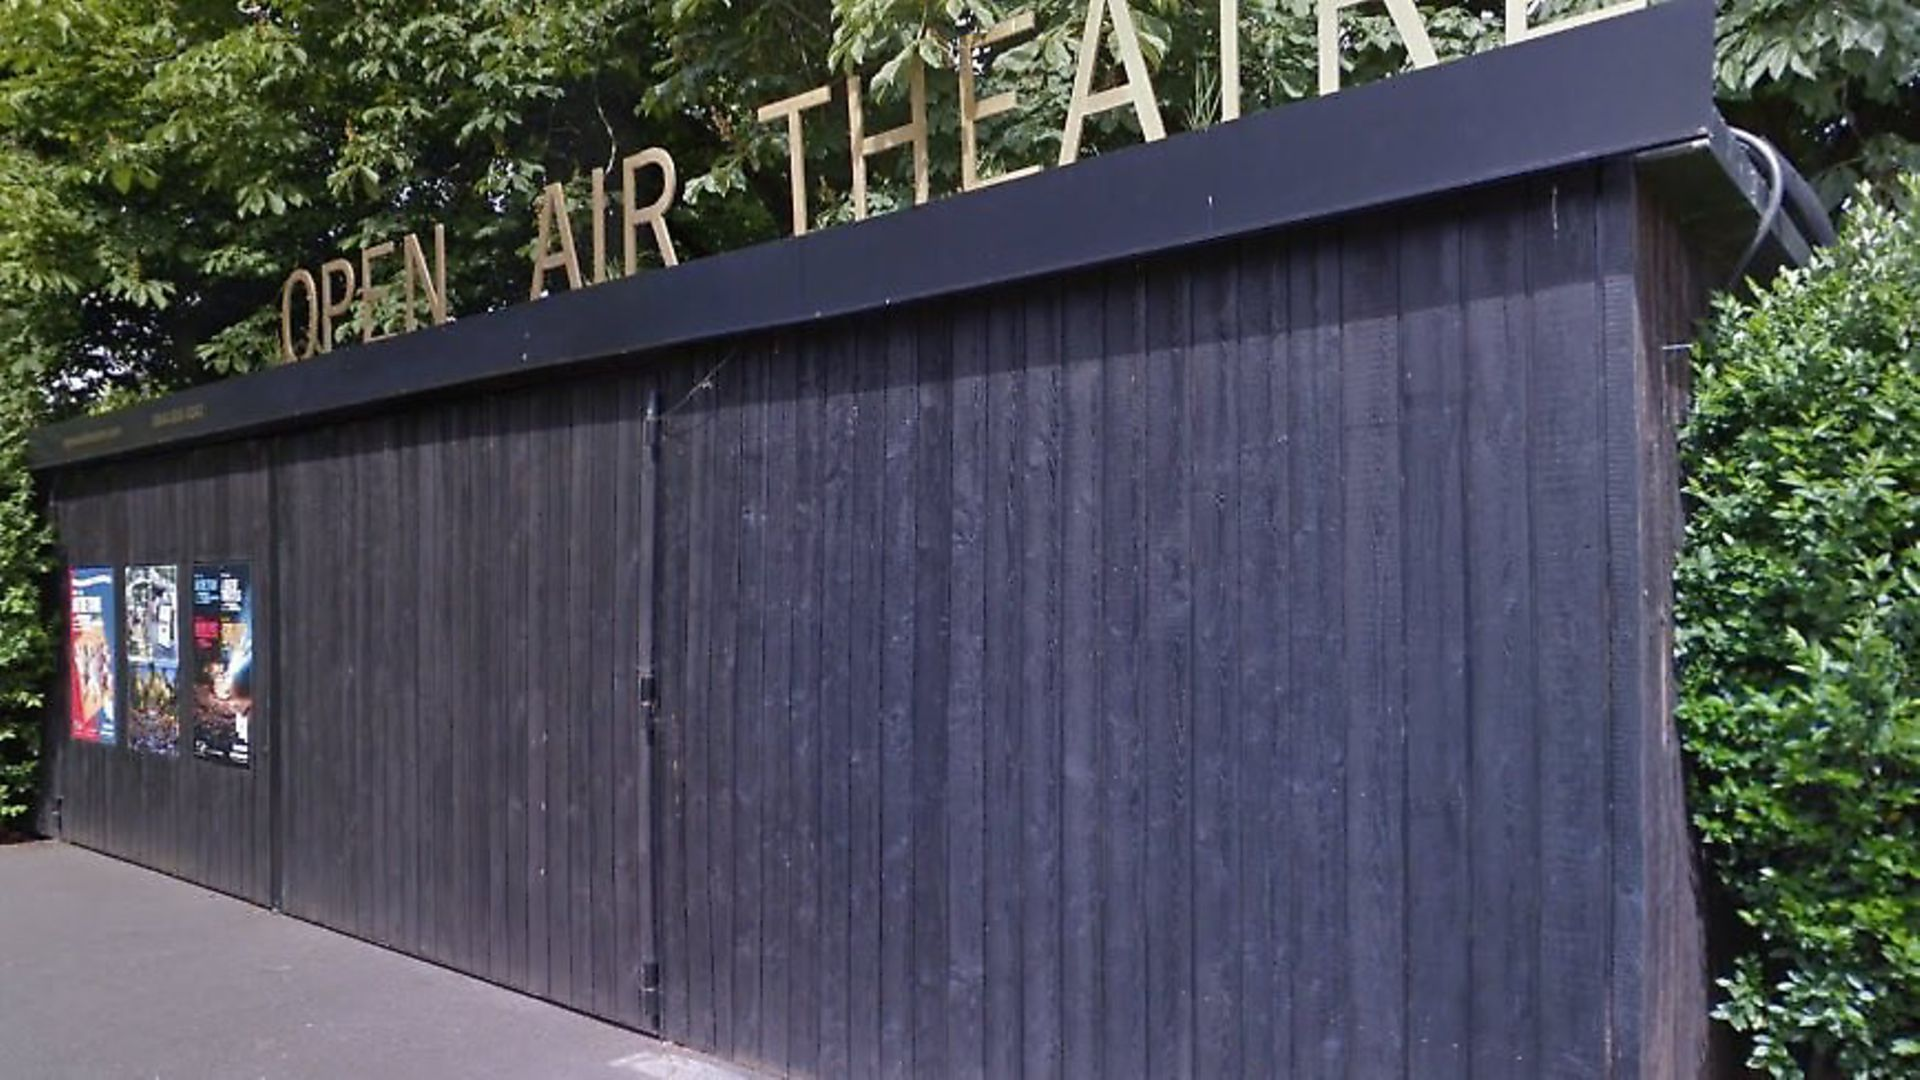 Regent's Park Open Air Theatre in London. Picture: Google - Credit: Archant